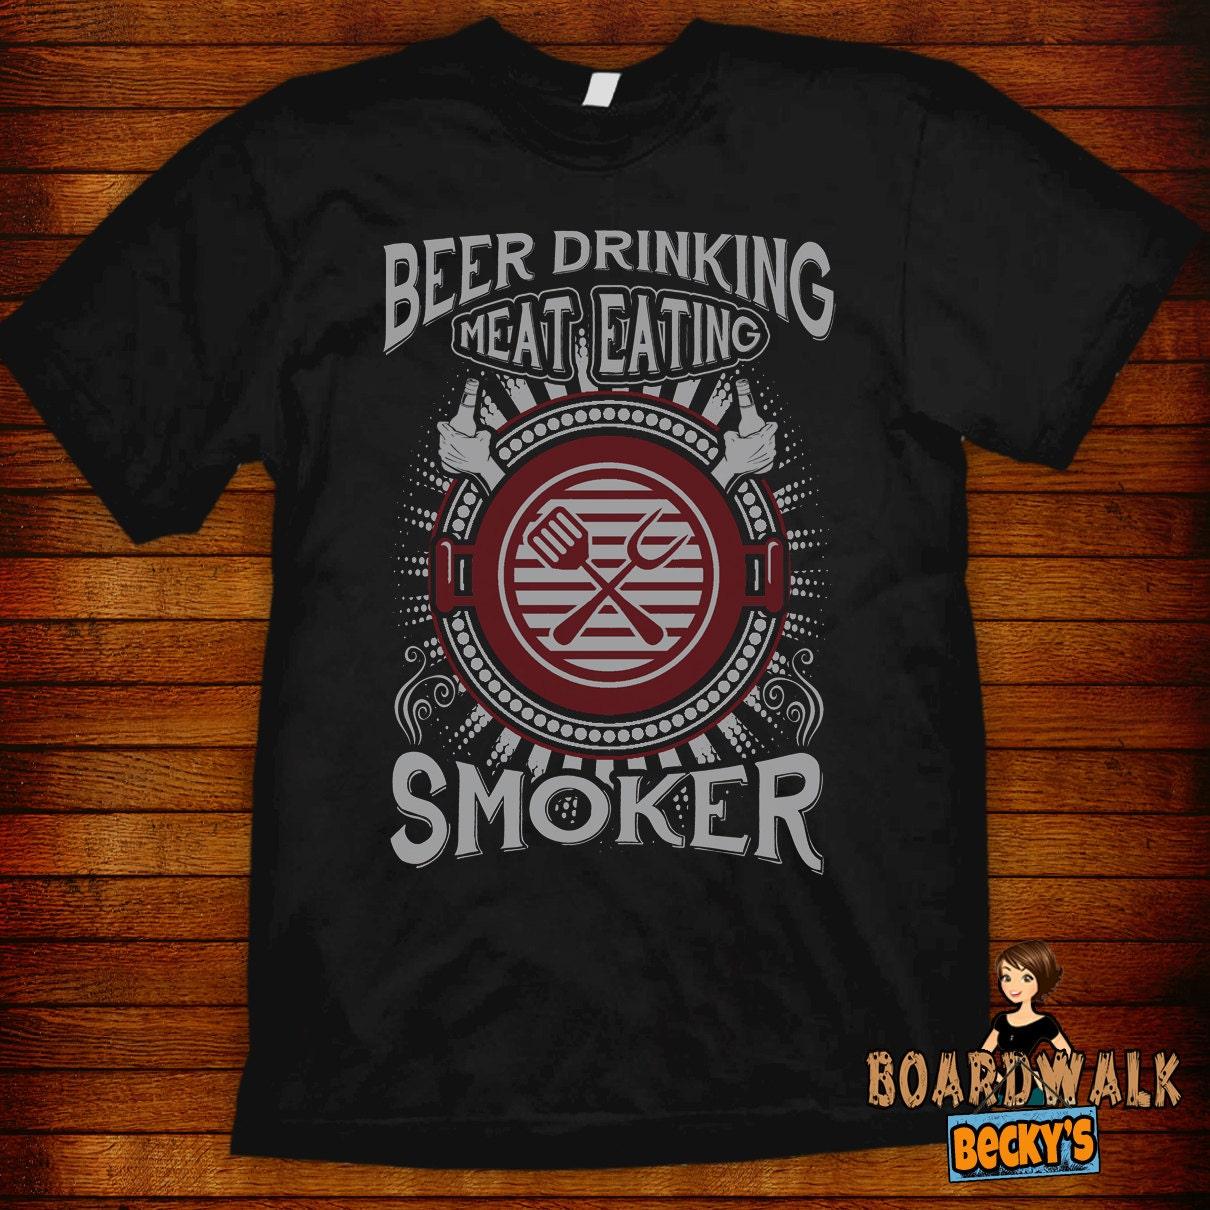 Best Beer Shirts Etsy - Bella Esa